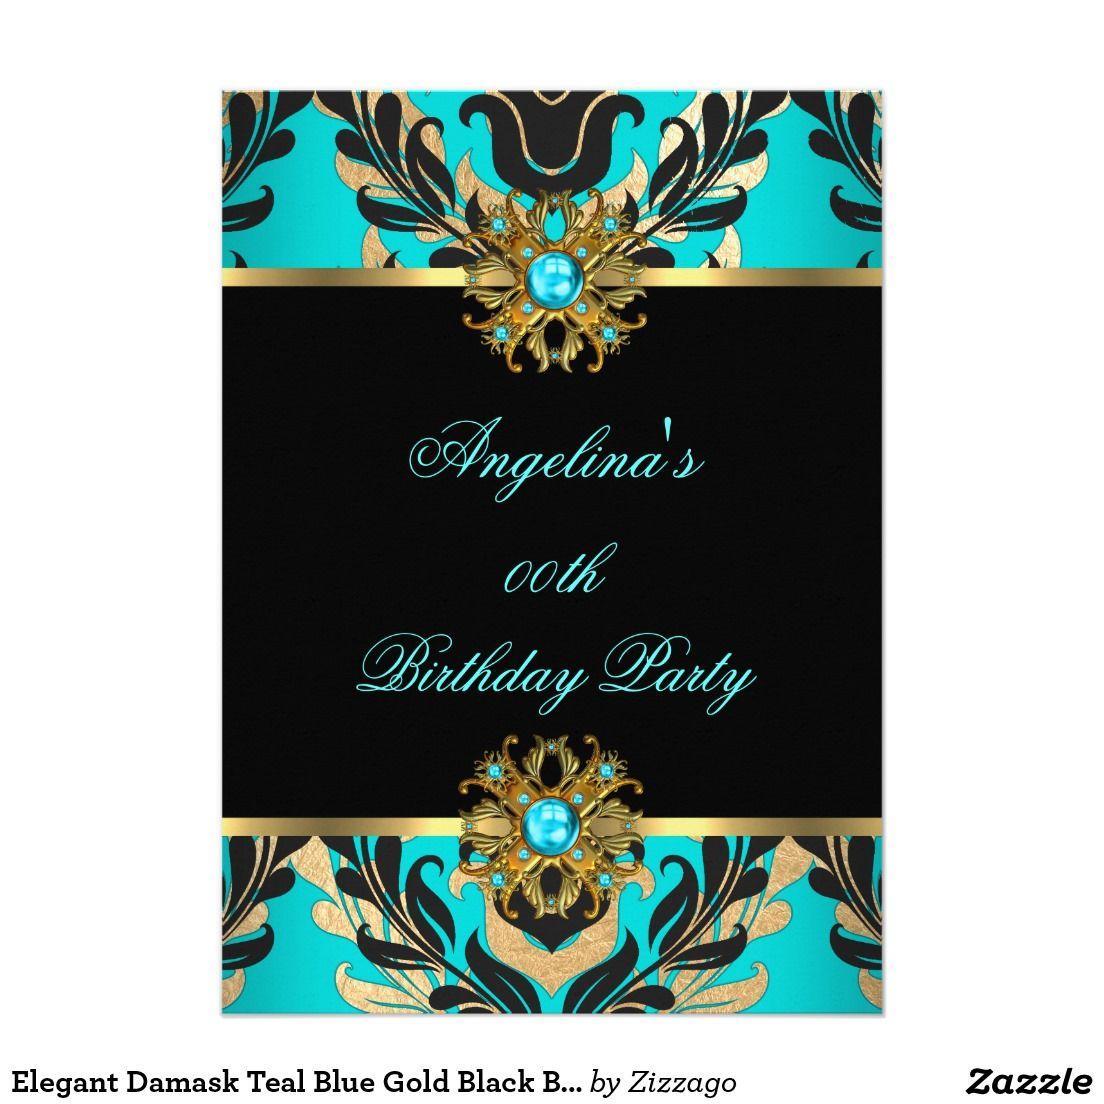 Elegant Damask Teal Blue Gold Black Birthday Party Invitation | Zazzle.com  in 2020 | Floral birthday party, Blue gold, Birthday party invitations